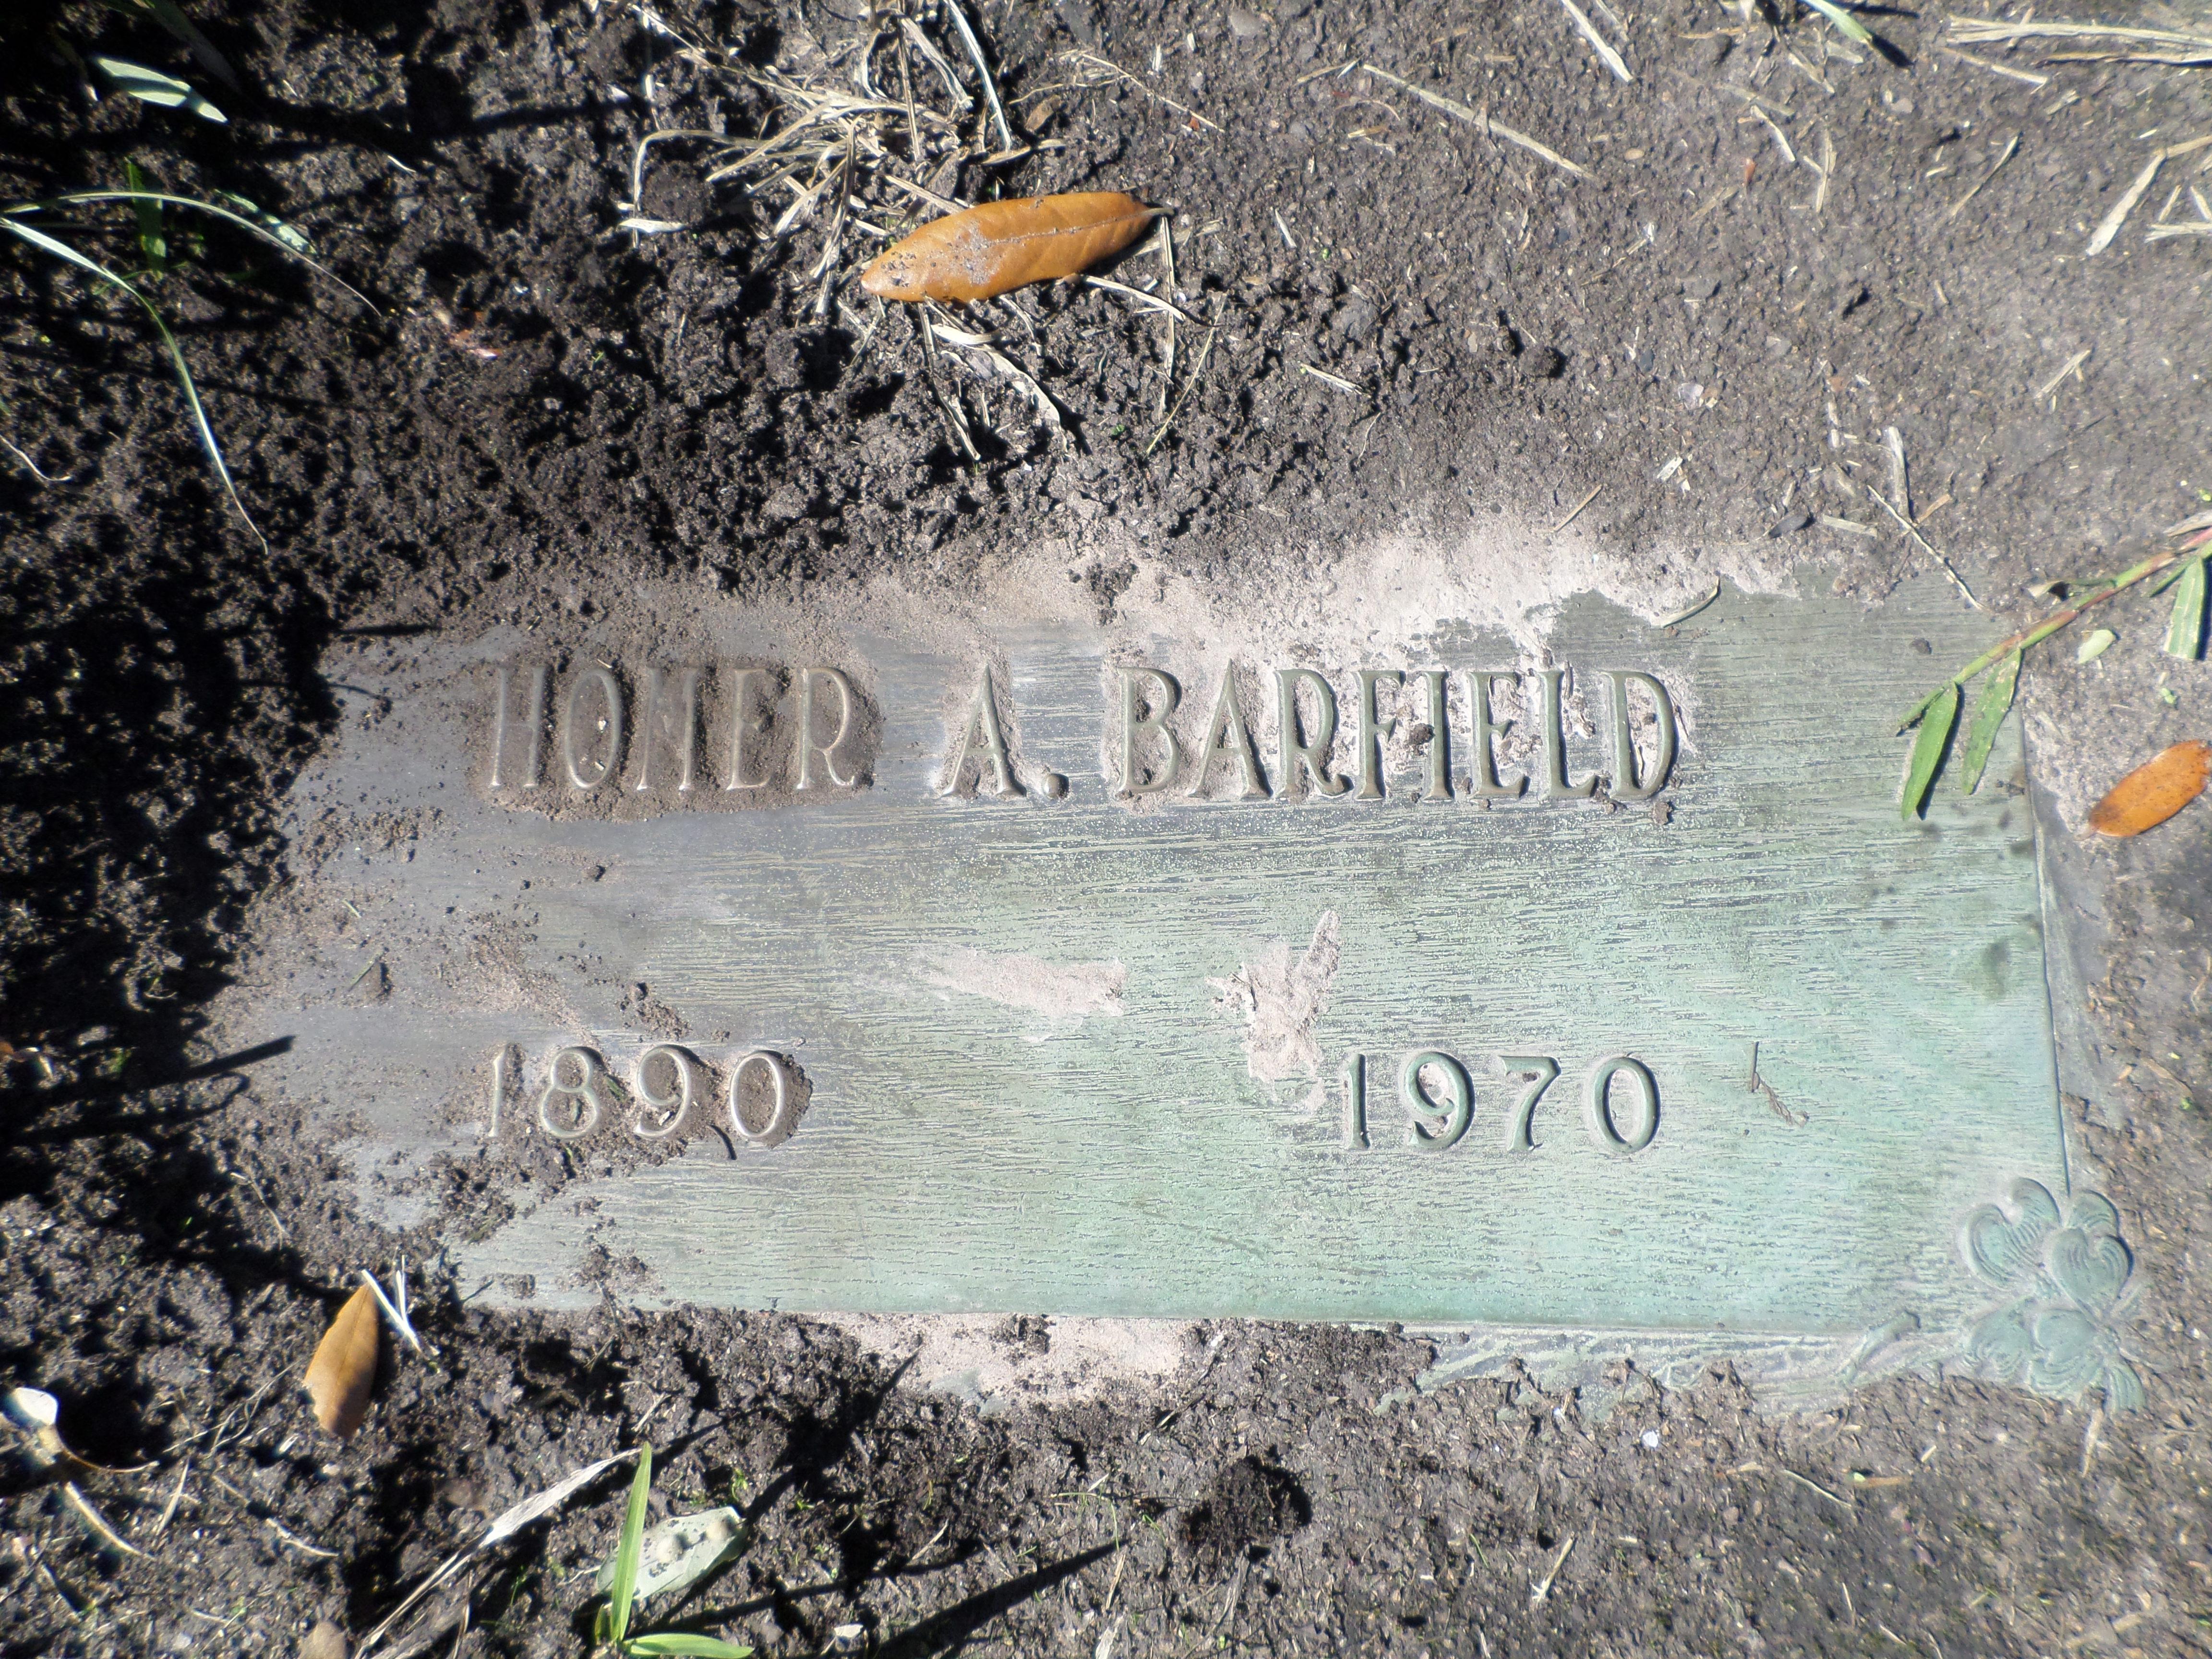 Homer Andrew Barfield